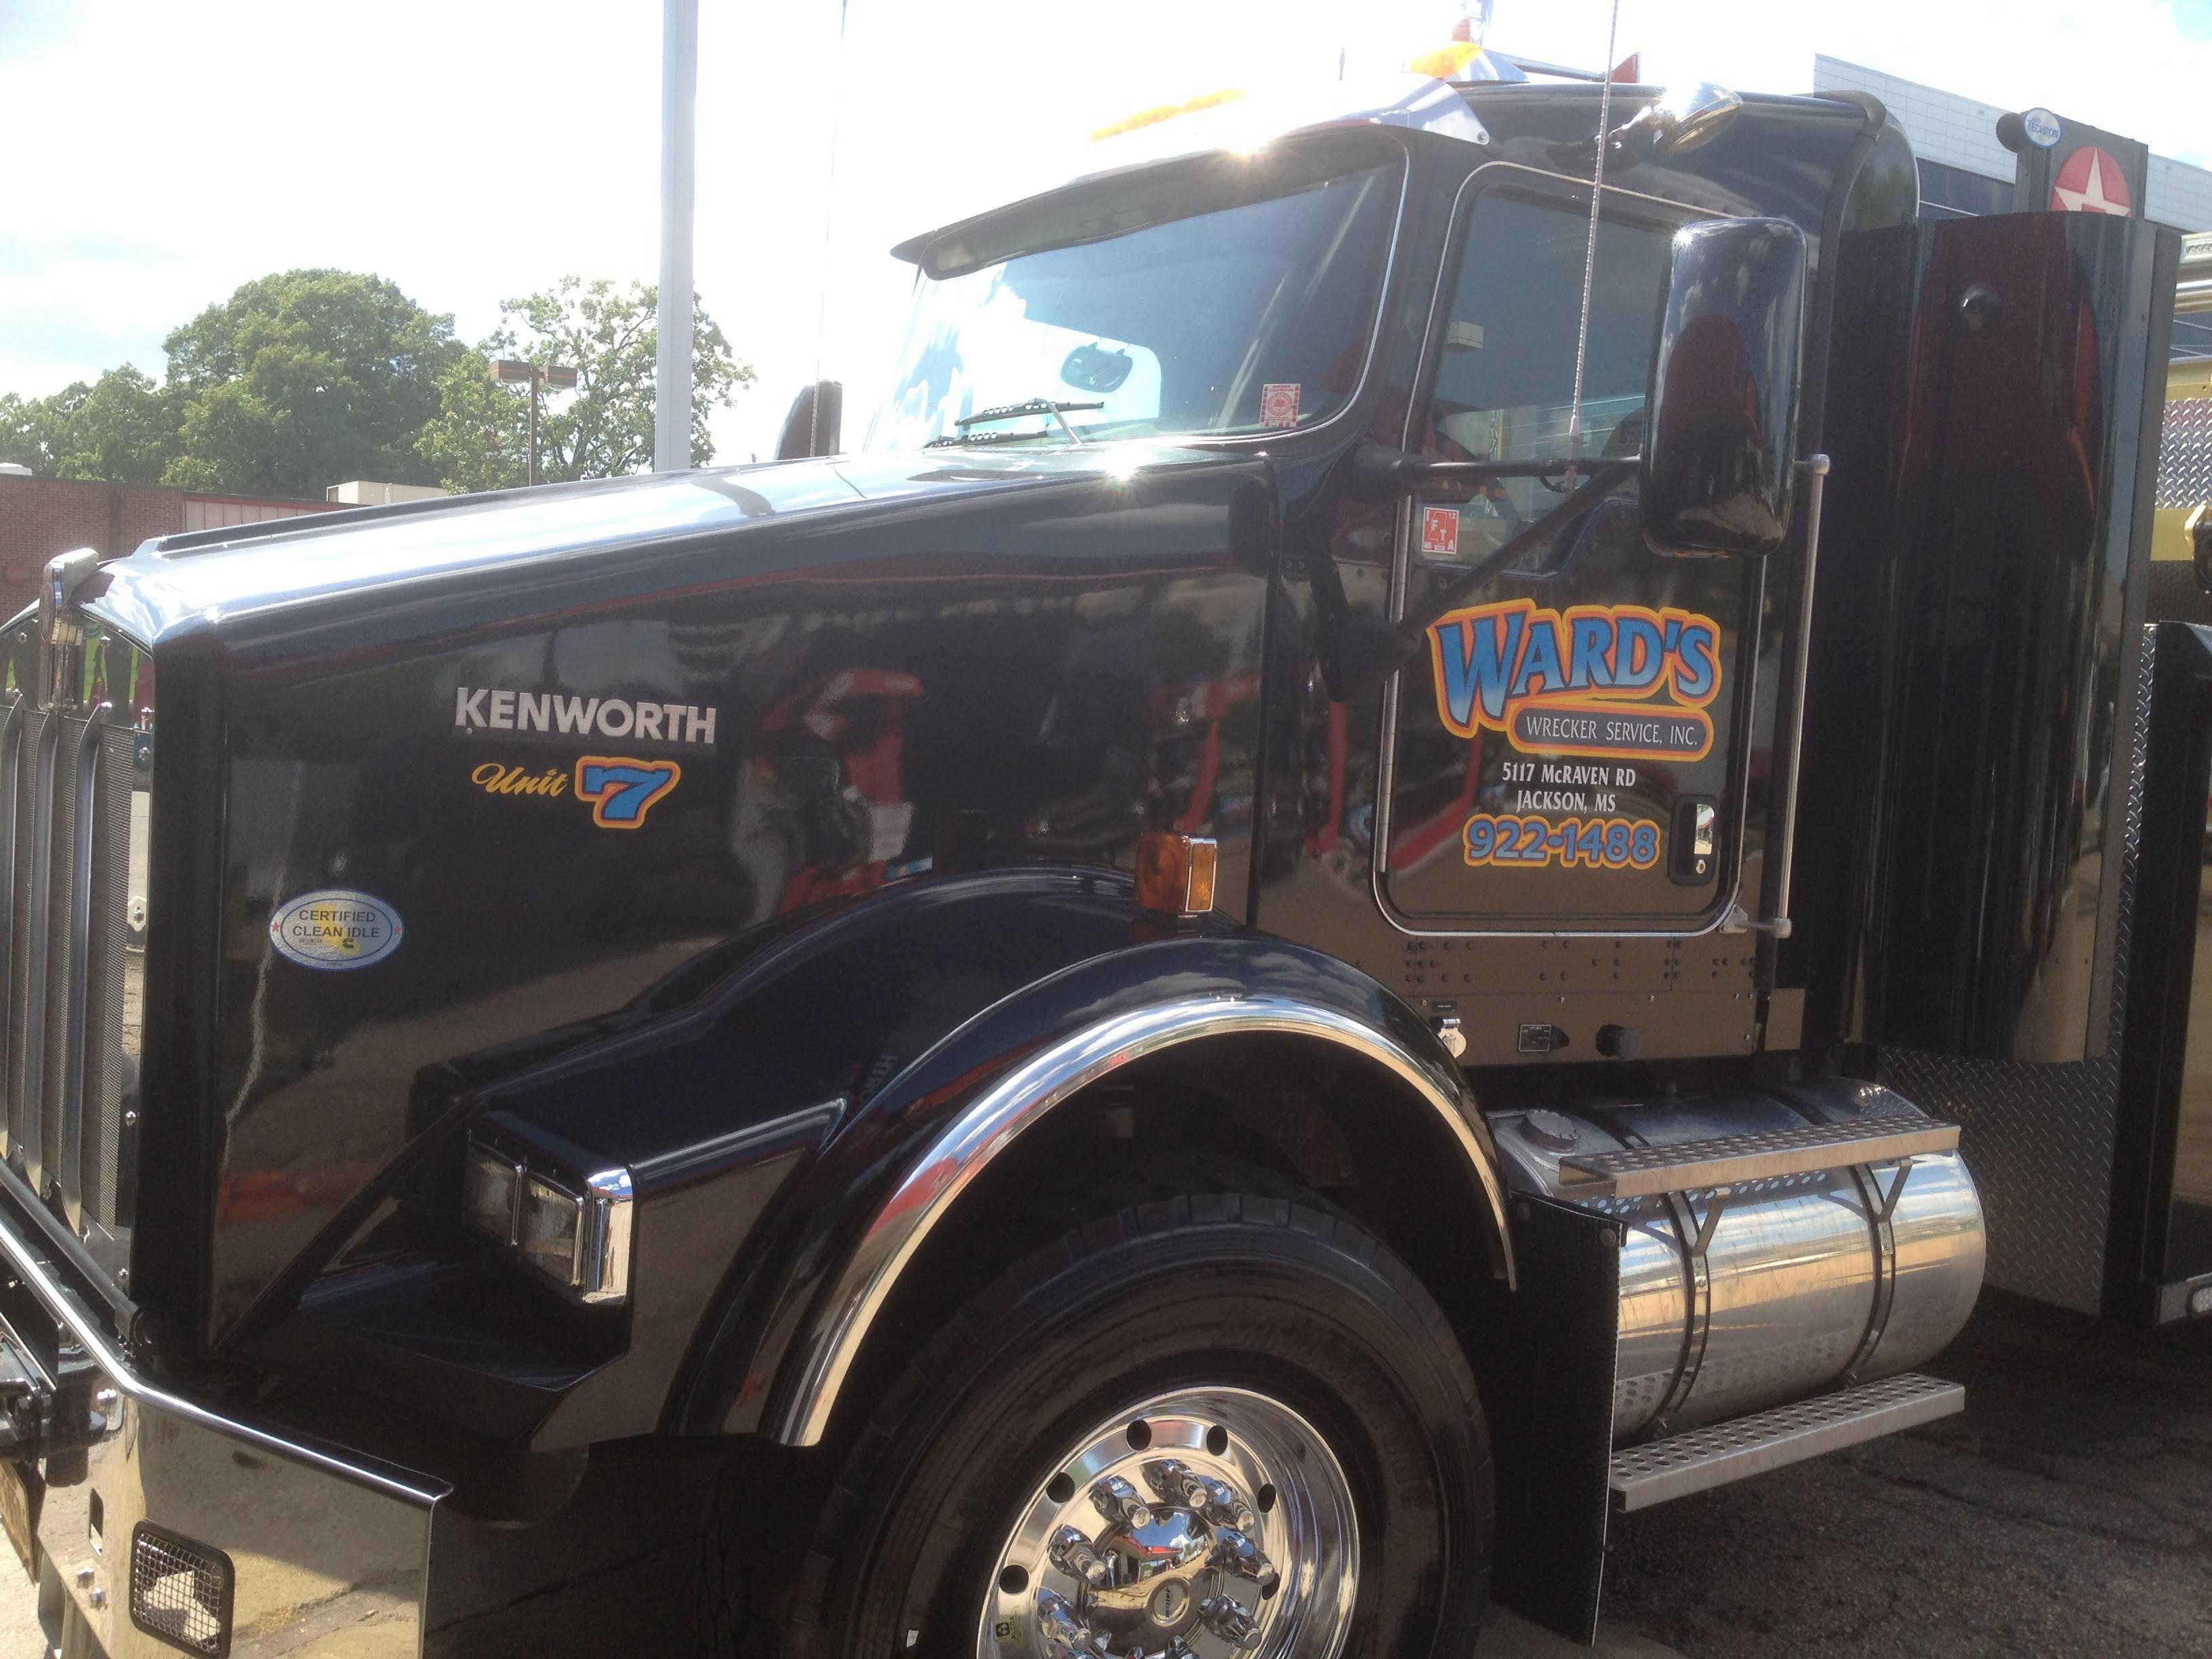 Ward's Wrecker Service Inc. image 2